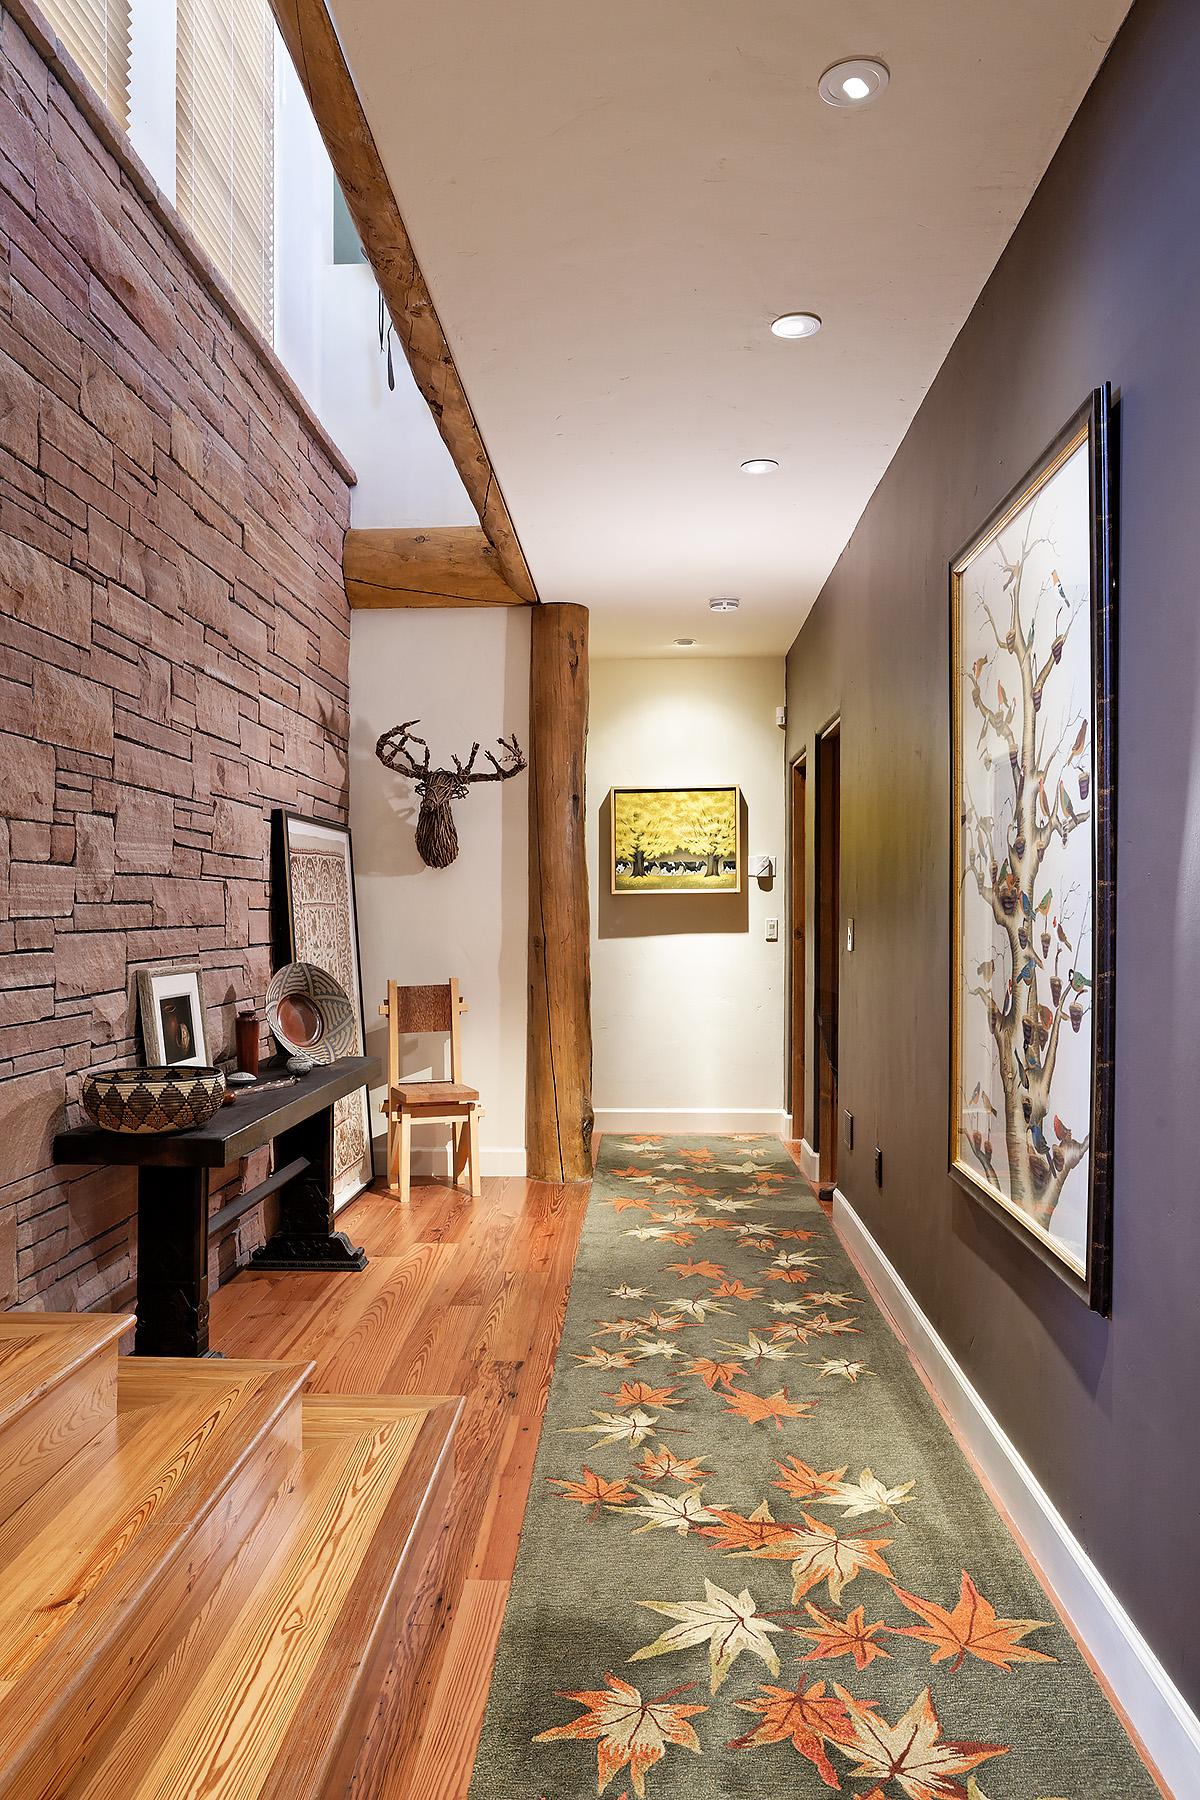 Lower level hallway